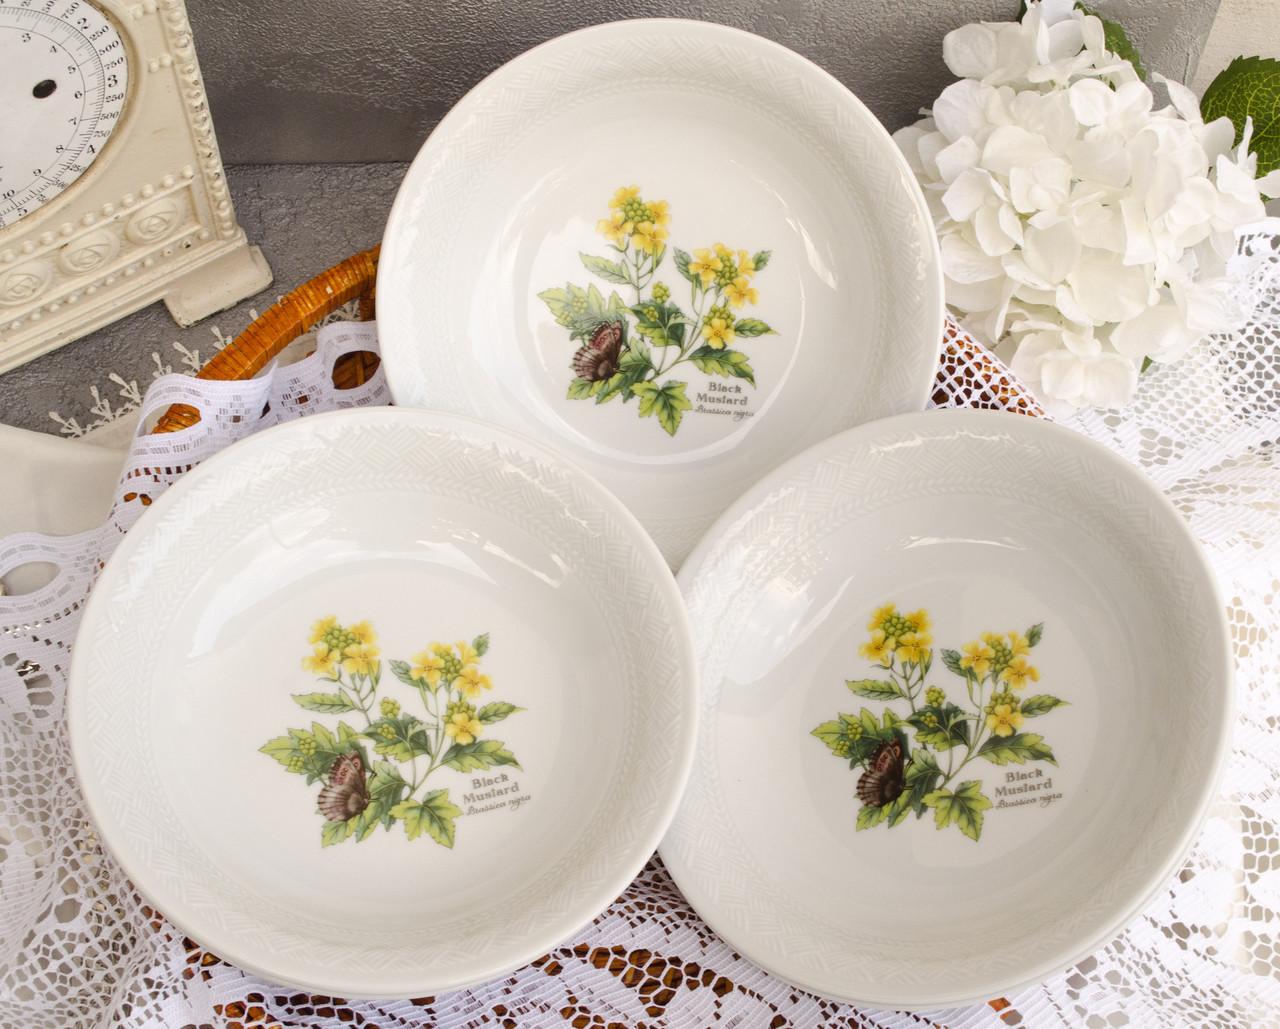 Шесть фарфоровых суповых тарелок, Royal Worcester, HERBS, Black Mustard Англия, винтаж